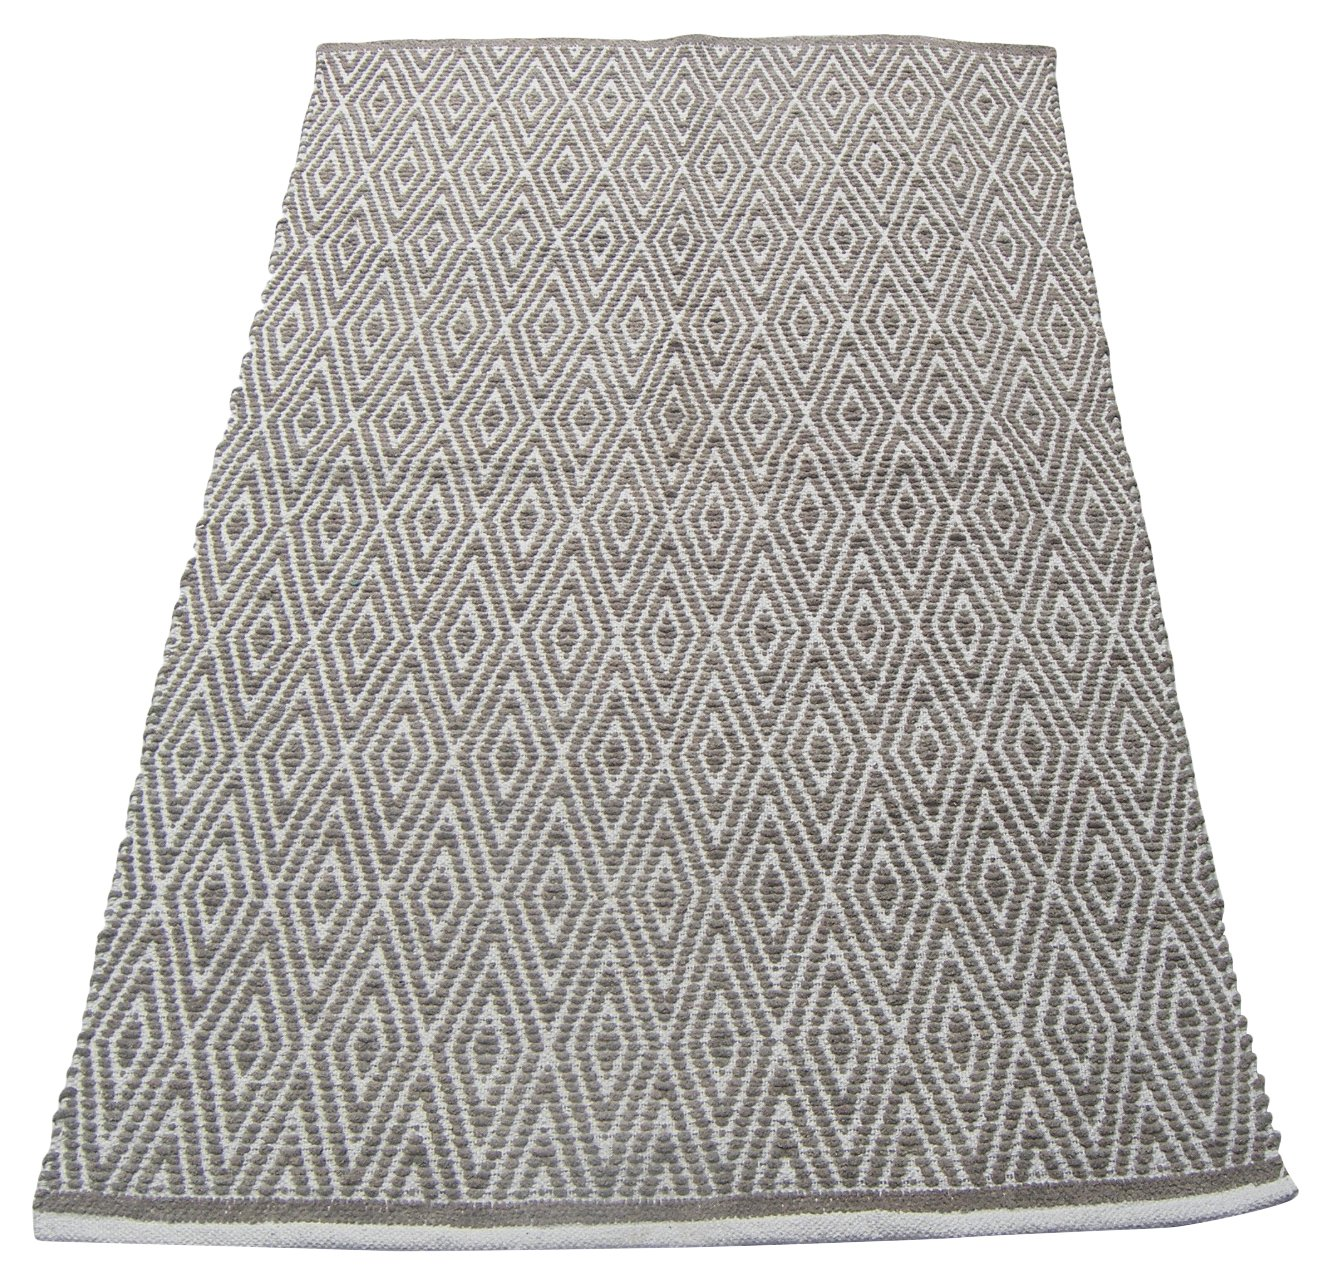 Chardin home 100 Cotton Diamond Area Rug Fully Reversible, Size – 3 x5 , Machine Washable, Grey White